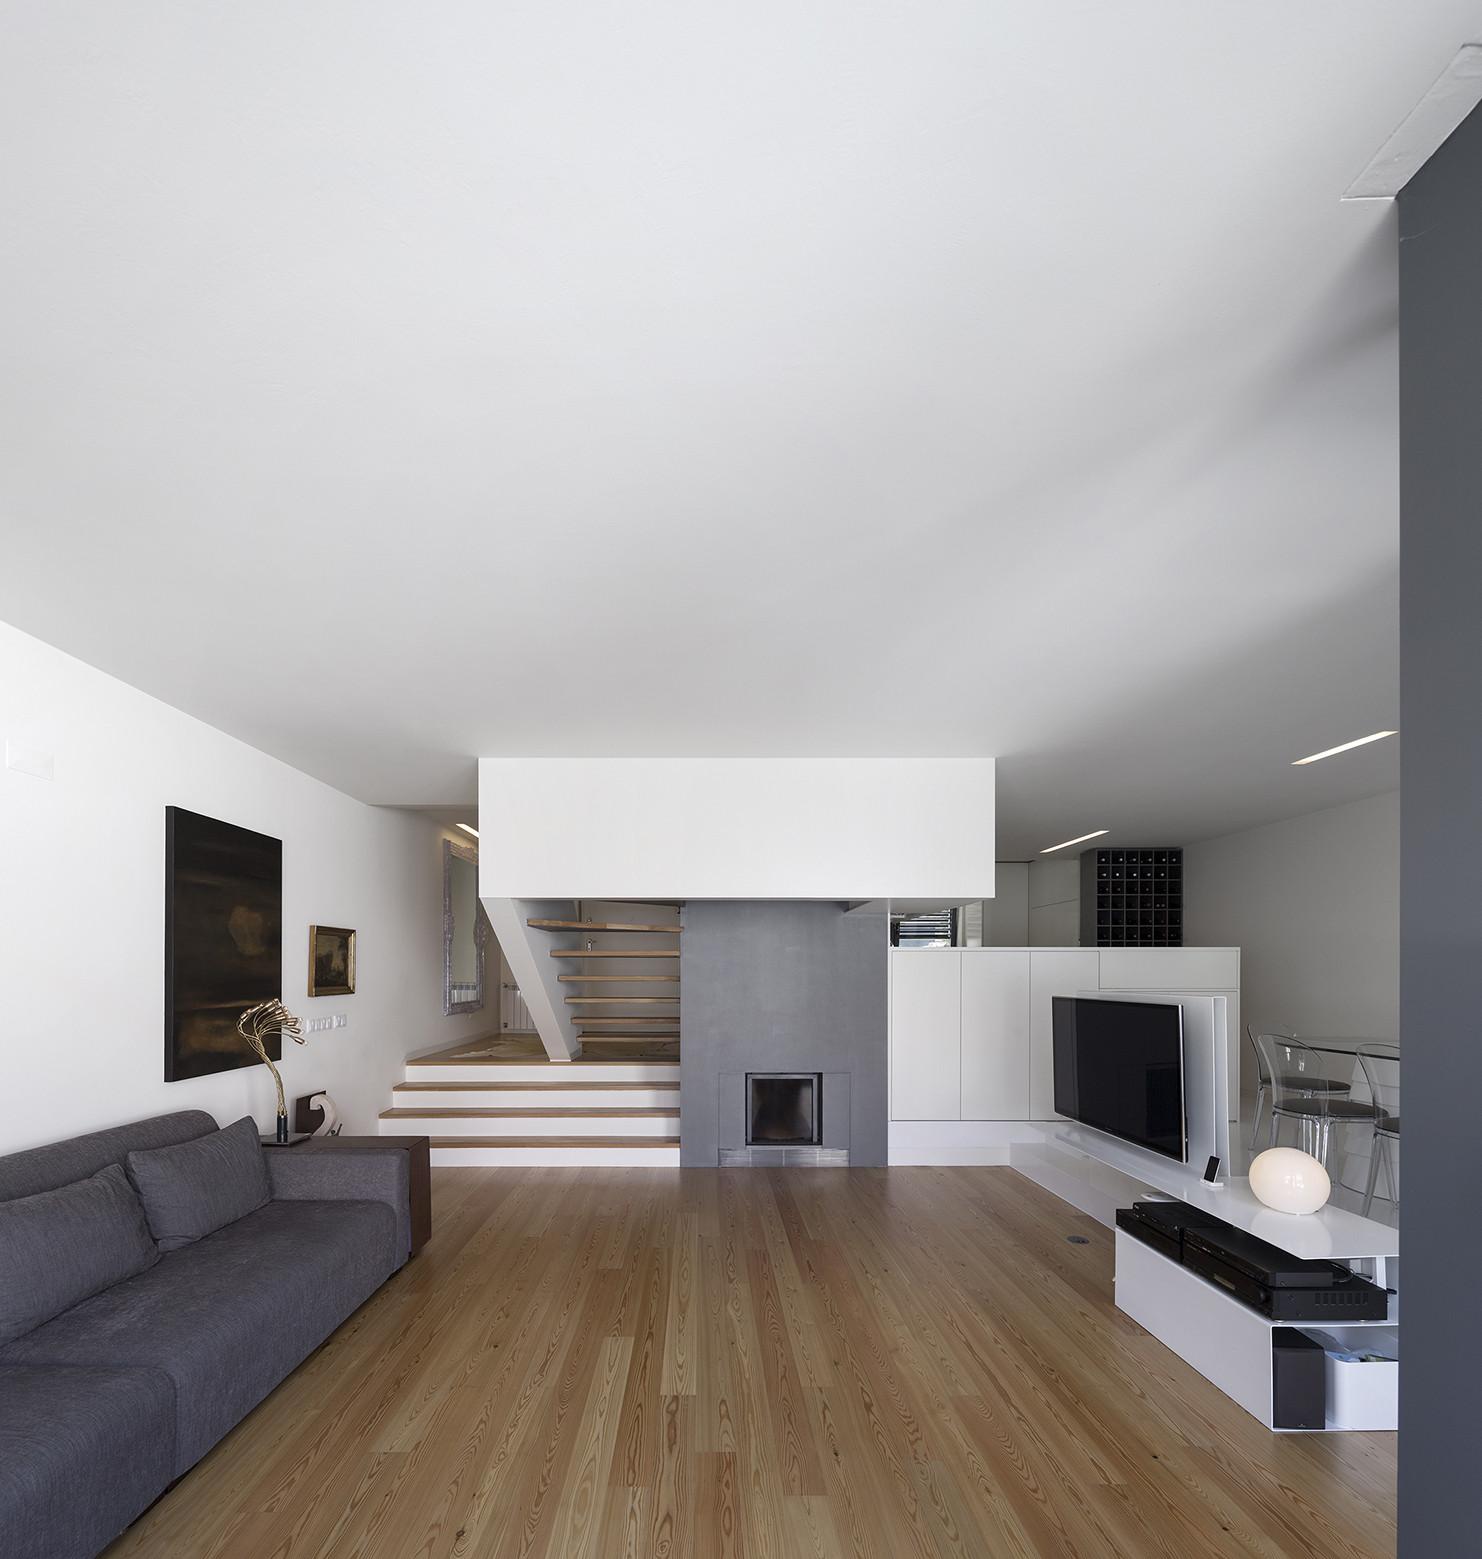 Casa no Restelo / Antonio Costa Lima Arquitectos, © Fernando Guerra | FG+SG